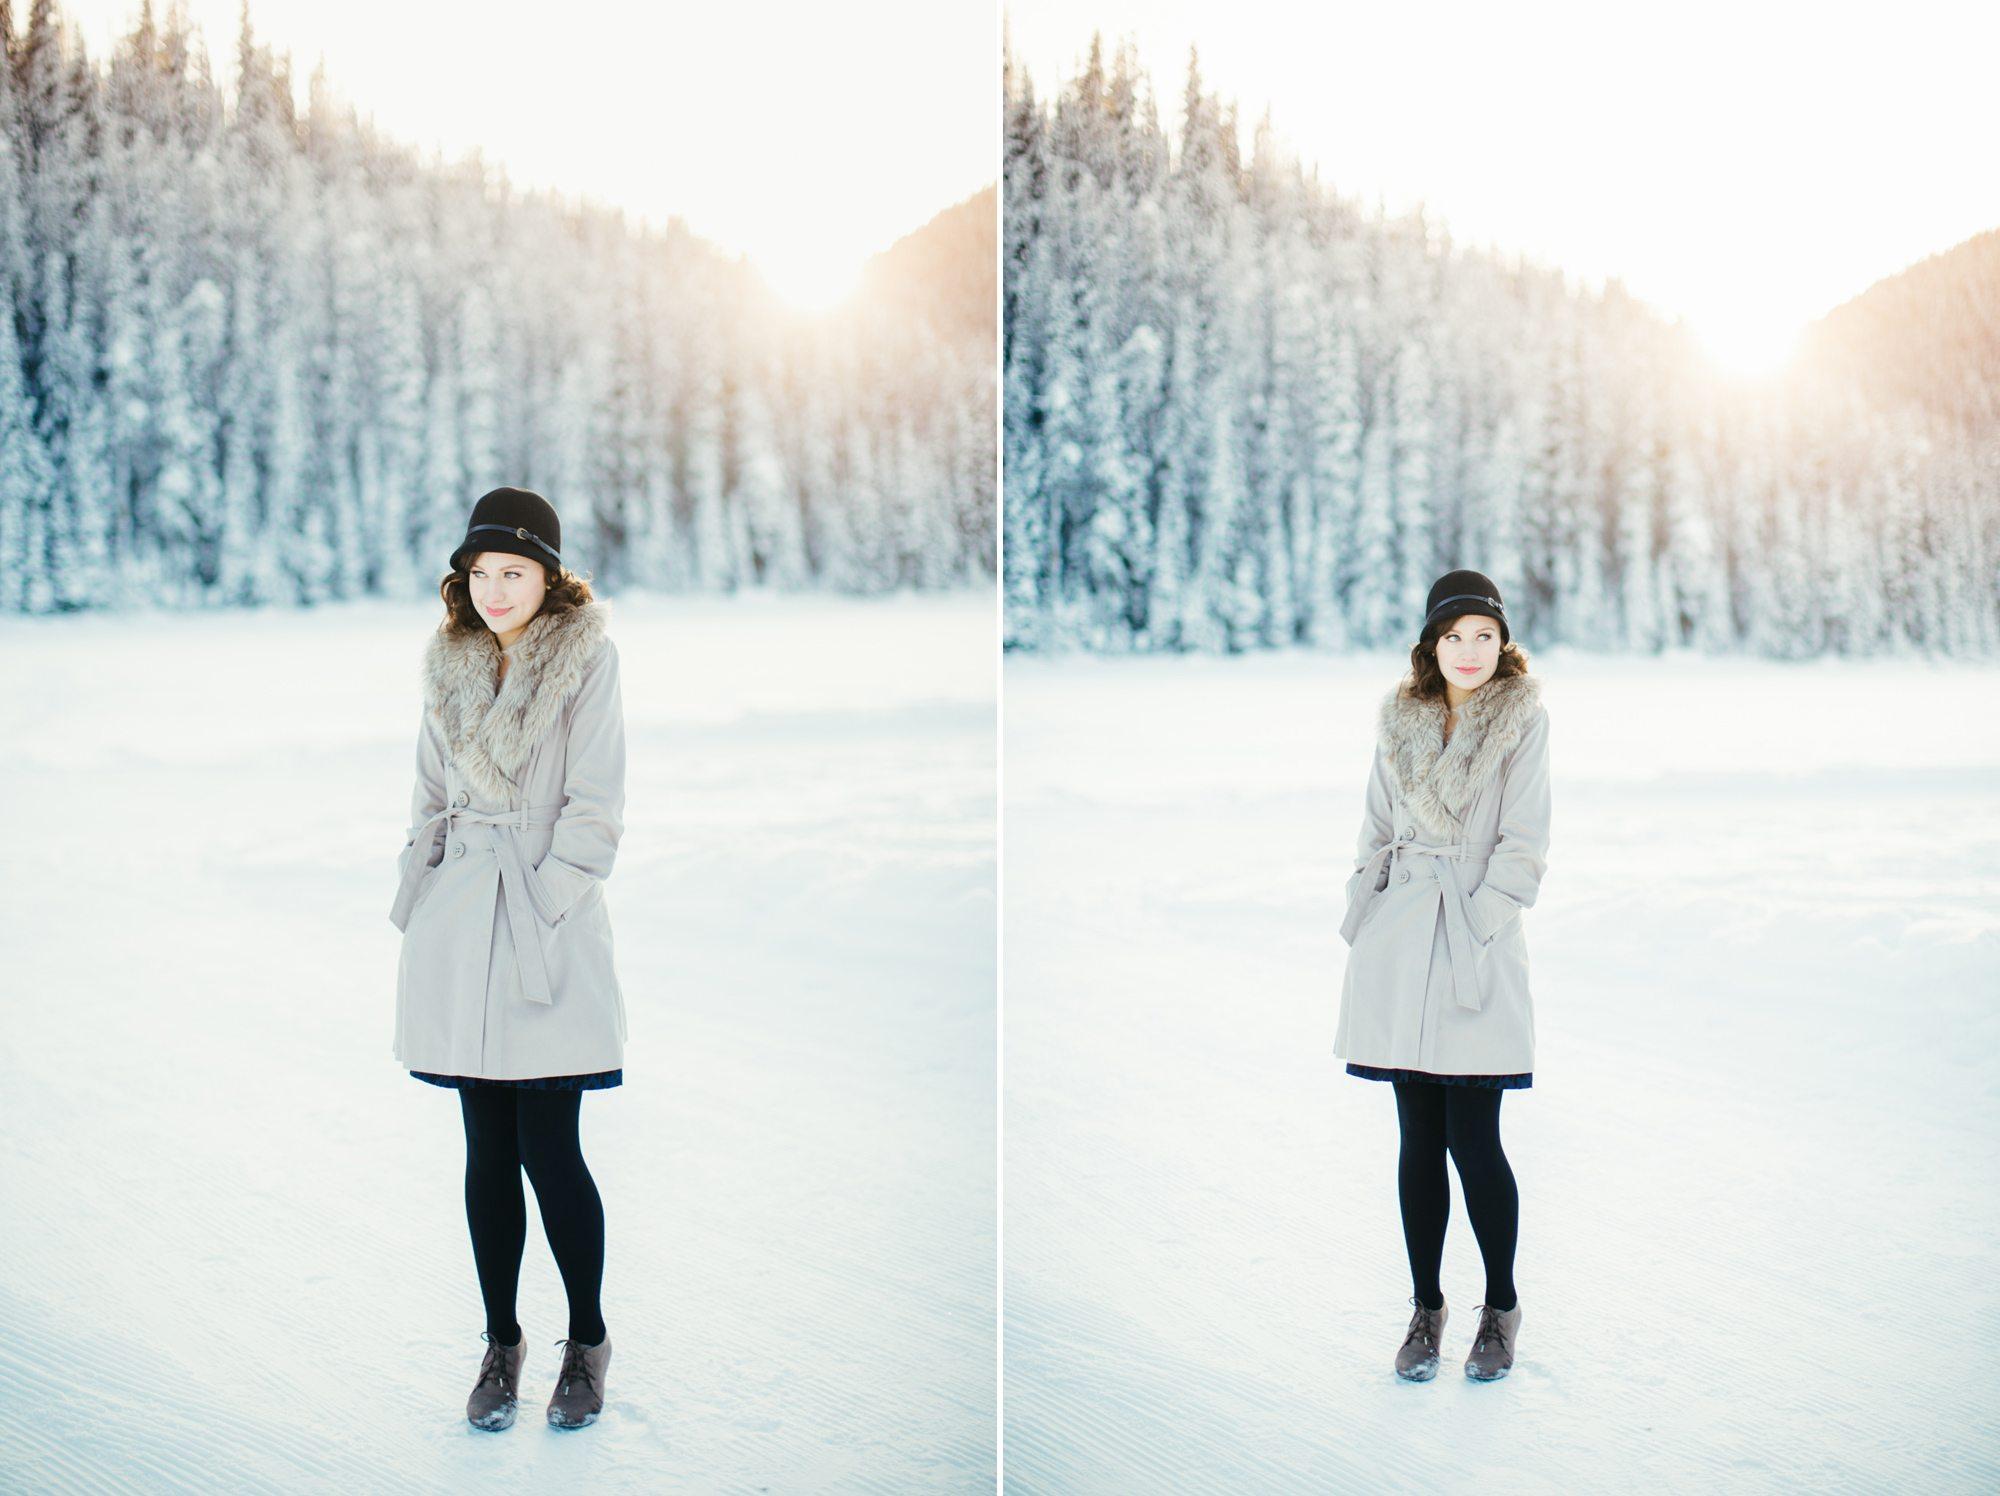 033-adventure-engagement-photographer